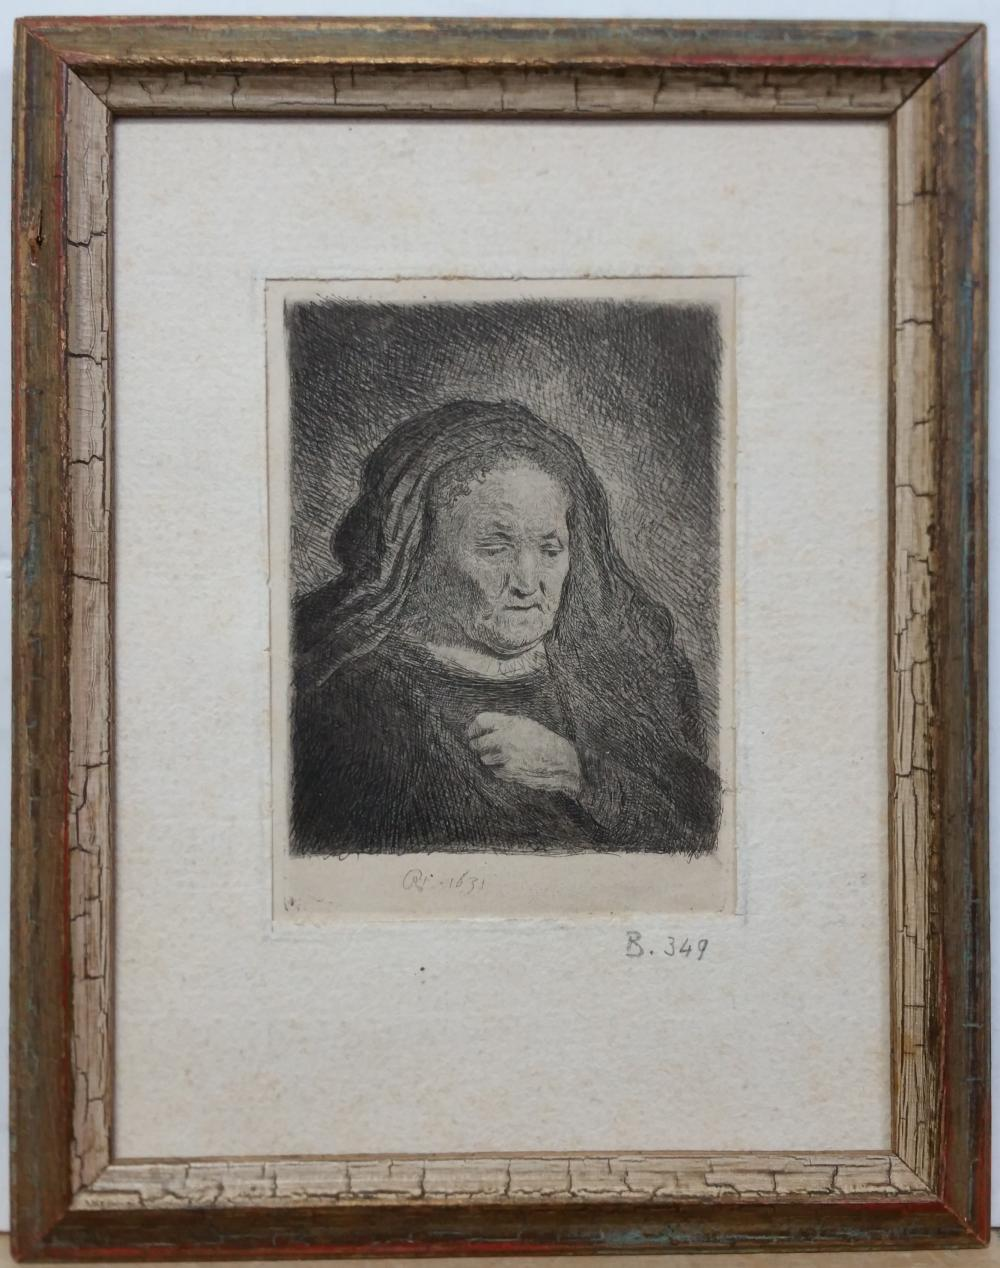 Rembrandt Artist Mother Portrait Etching Plate Date 1631 Antique Impression Plate 349